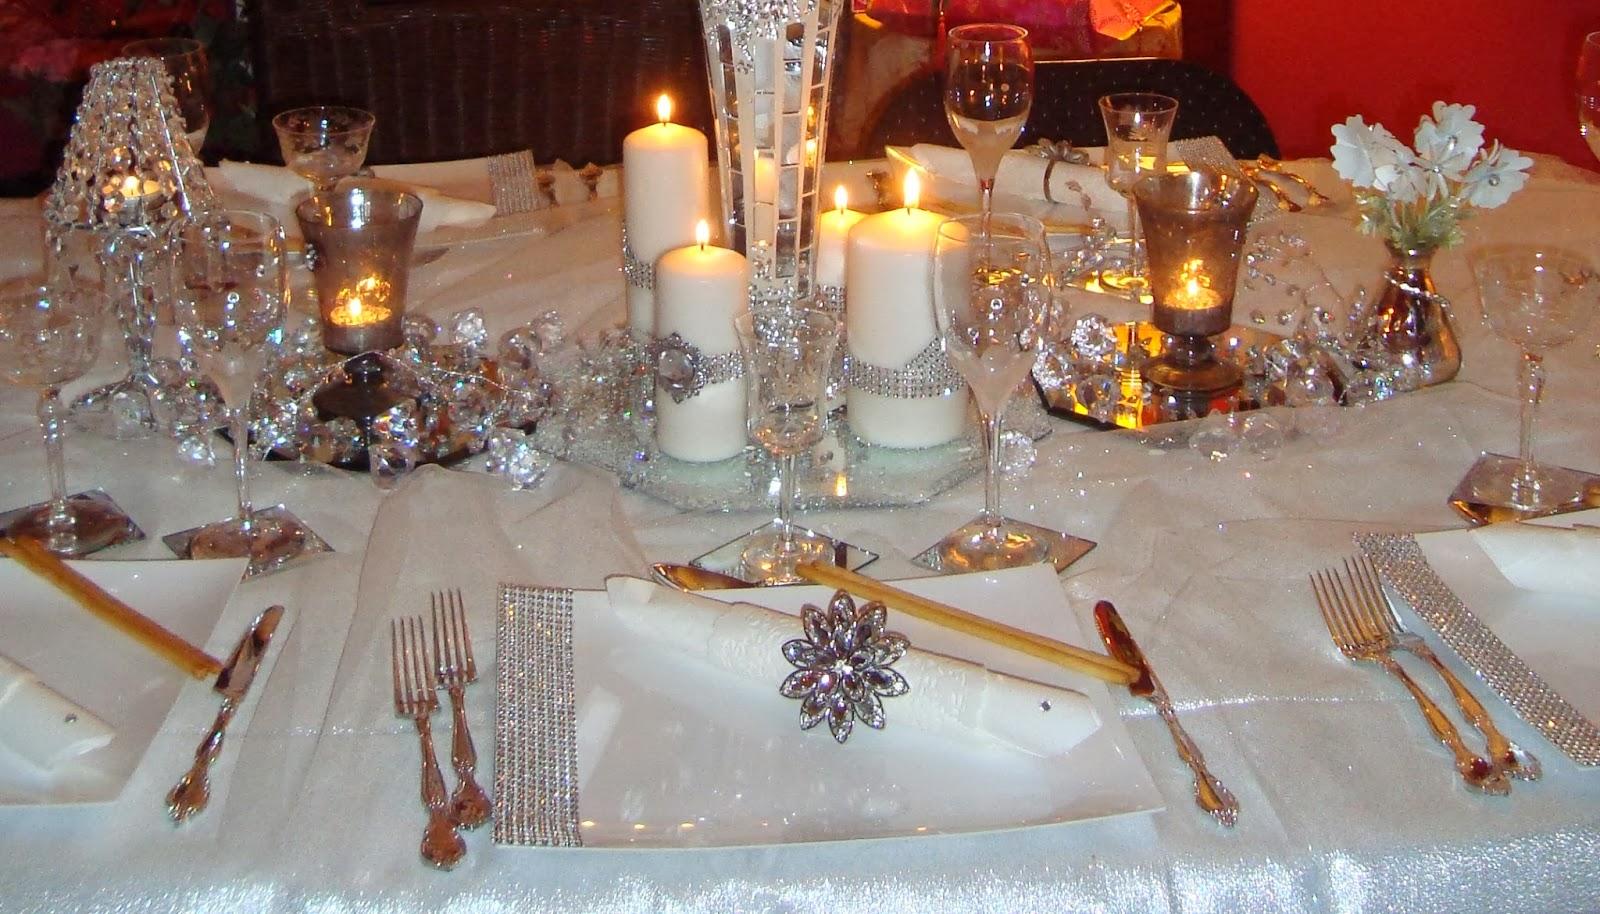 Rosebud 39 s castle snow glitz fairies - Smashing glass coasters ...